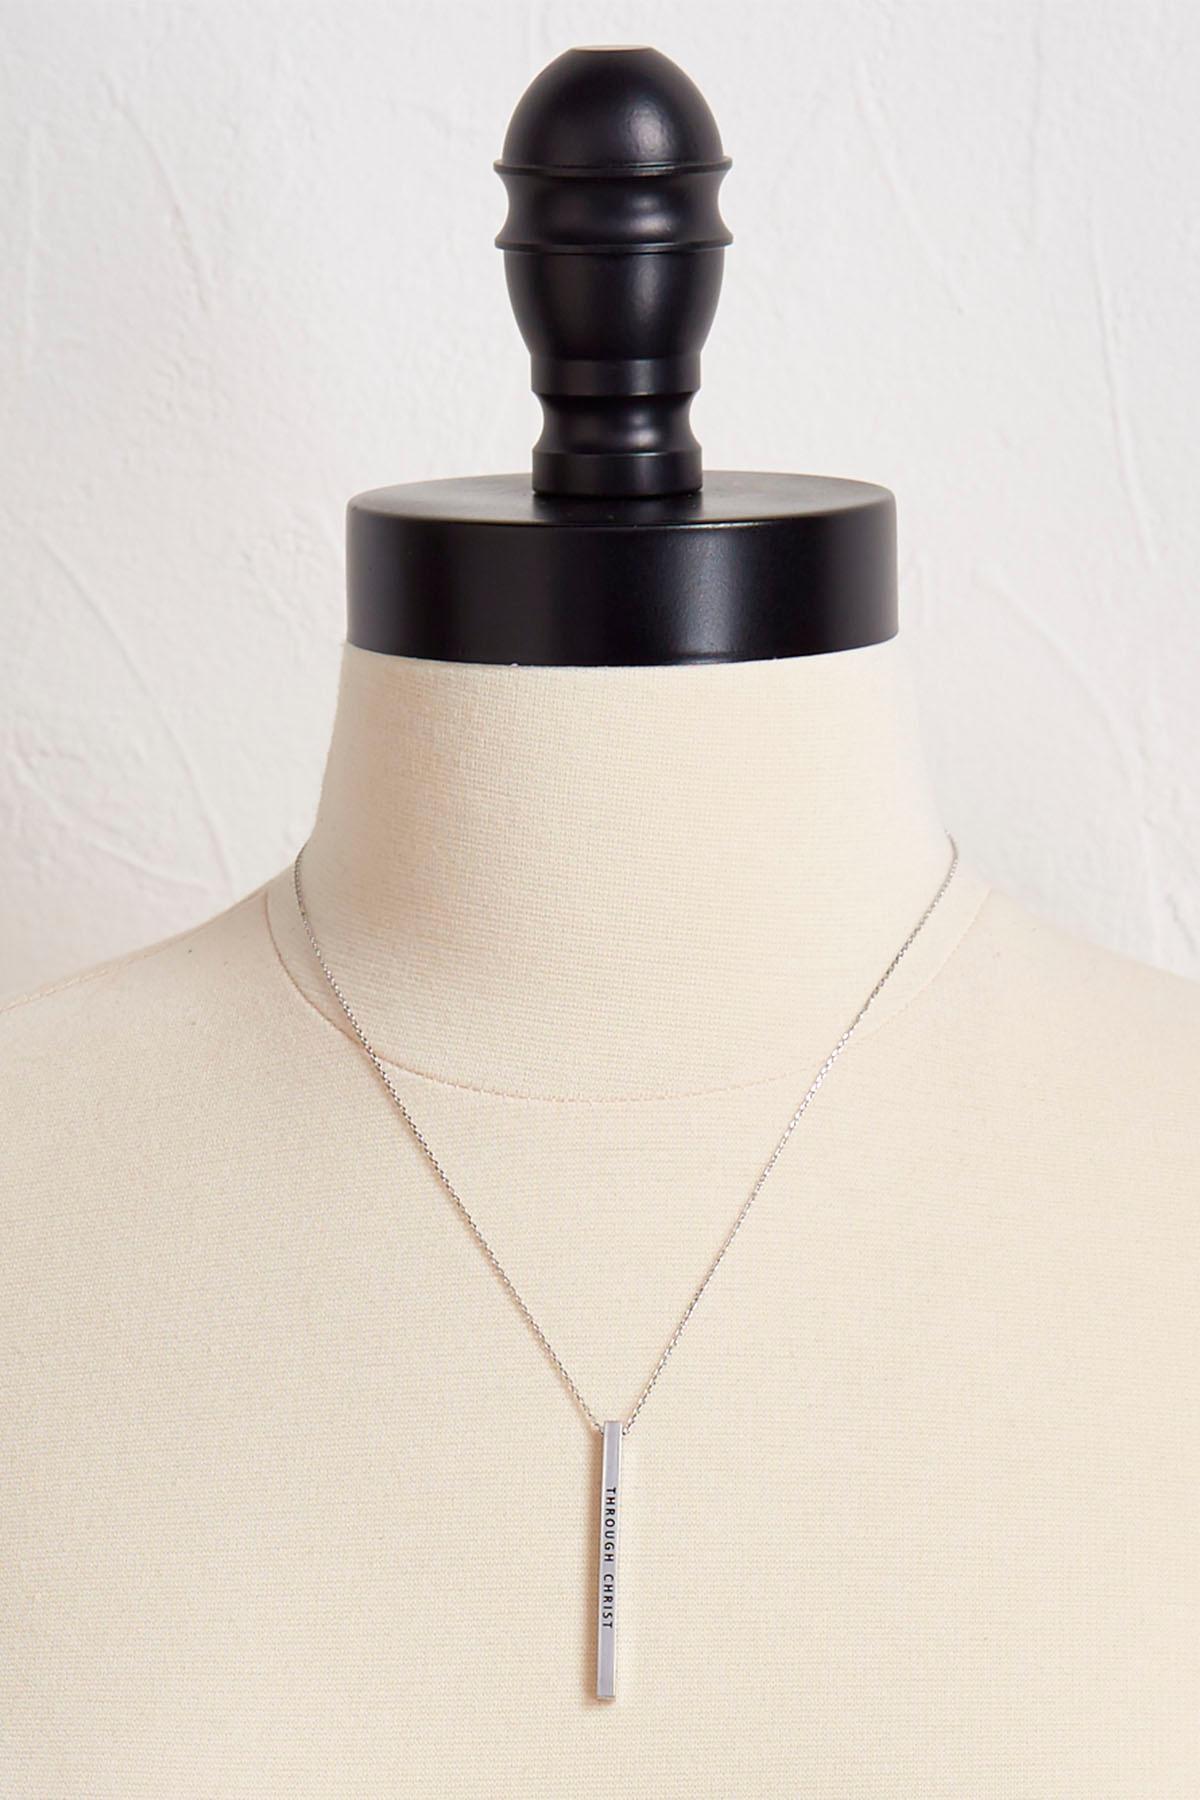 Versona inspirational bar pendant necklace inspirational bar pendant necklace aloadofball Choice Image